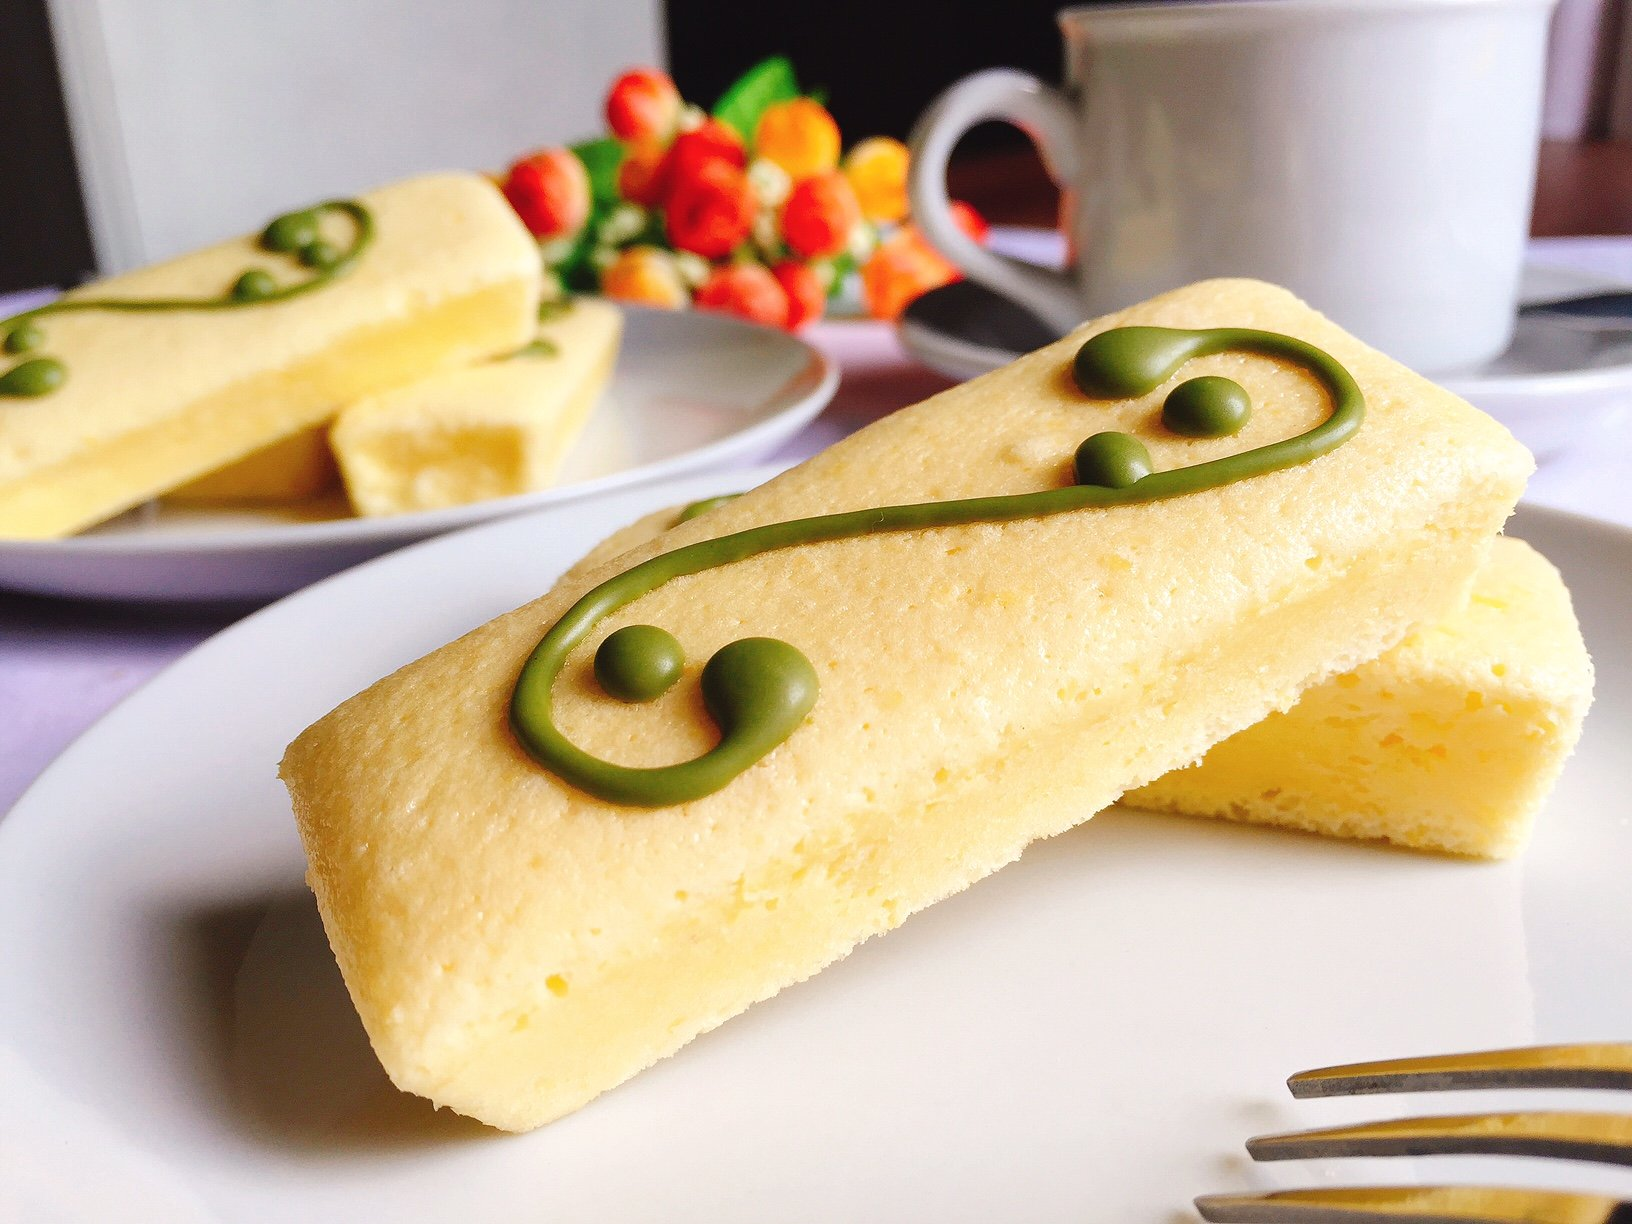 Resep Cake Keju Enak: Resep Membuat Bolu Keju Panggang Mudah Dan Enak